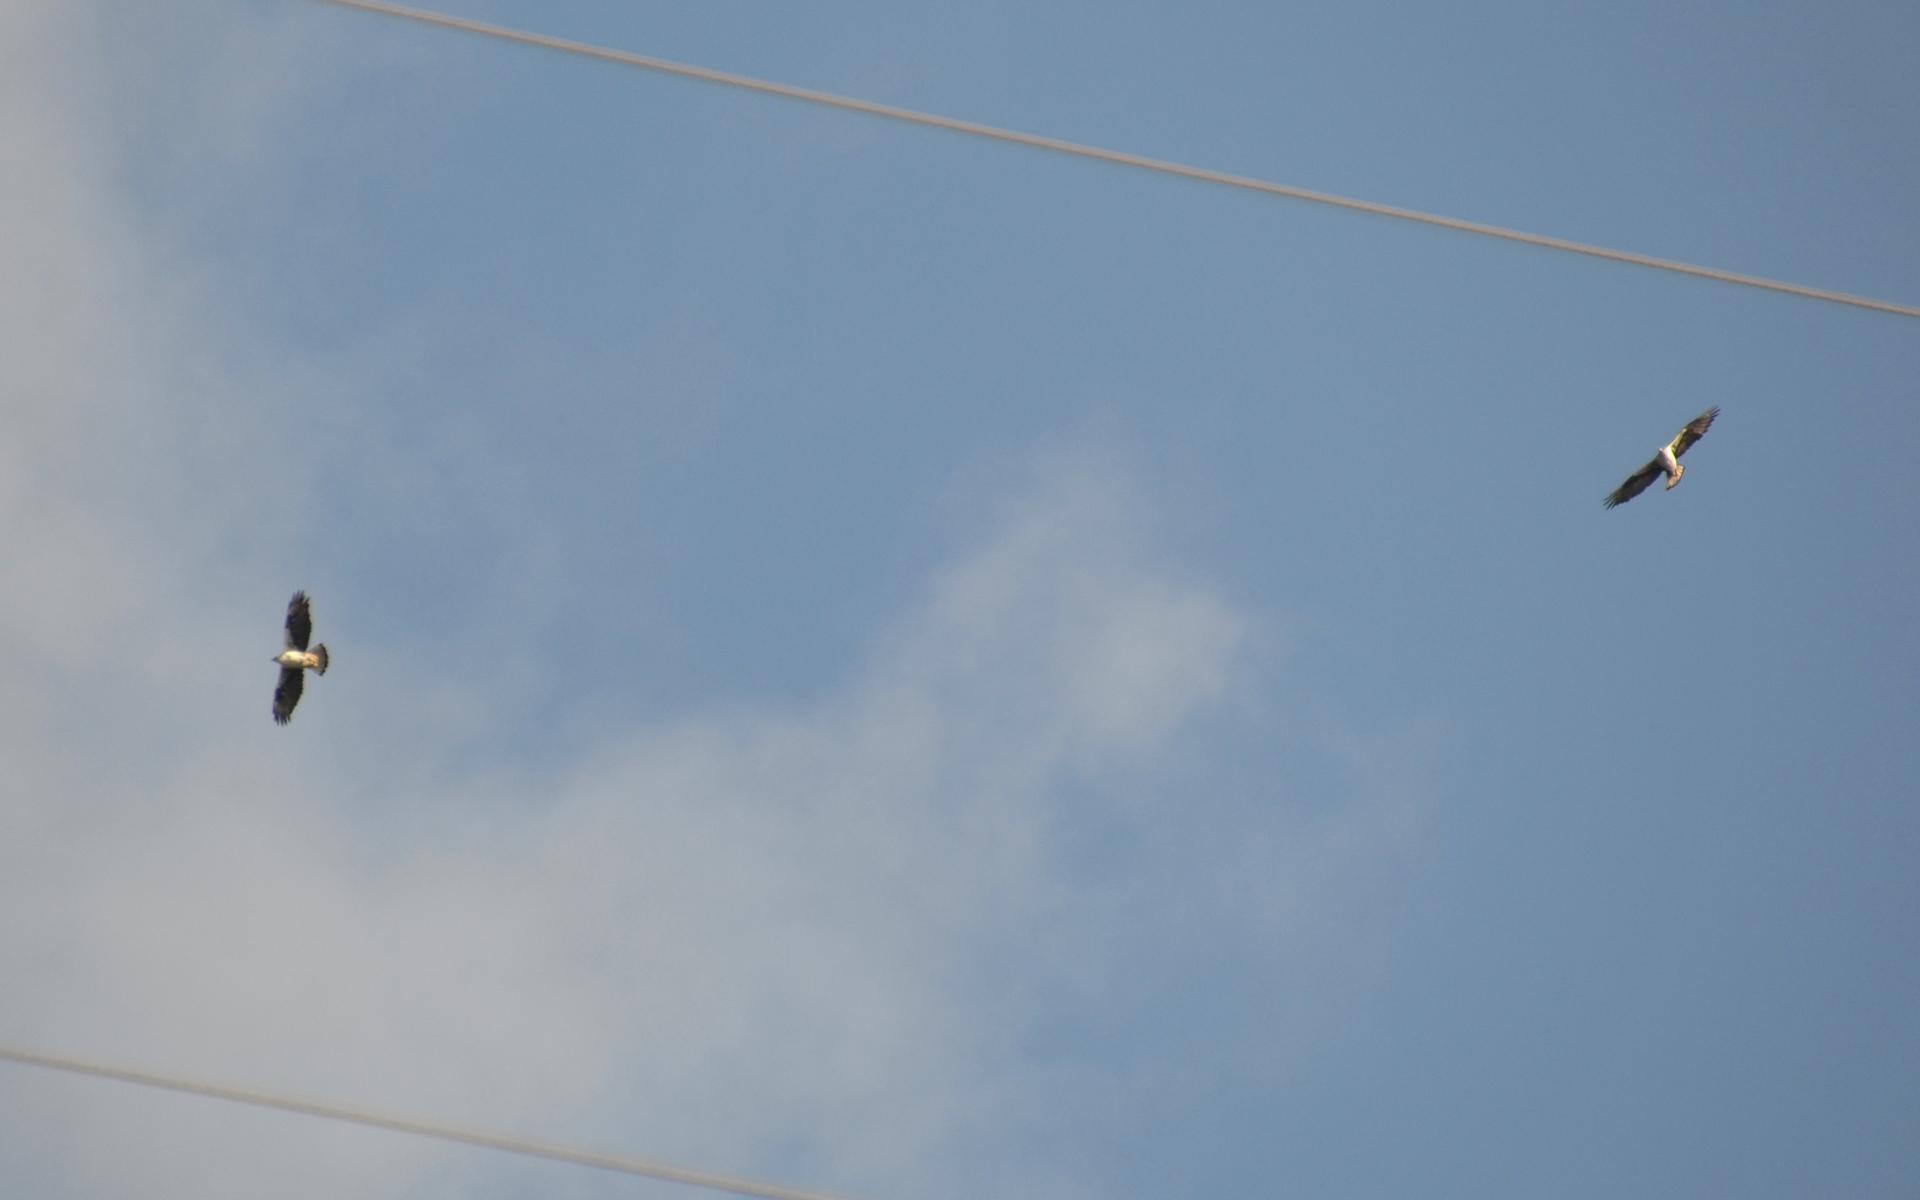 Aigle de bonelli (Crédits: Birdwatching Barcelona - Flickr)